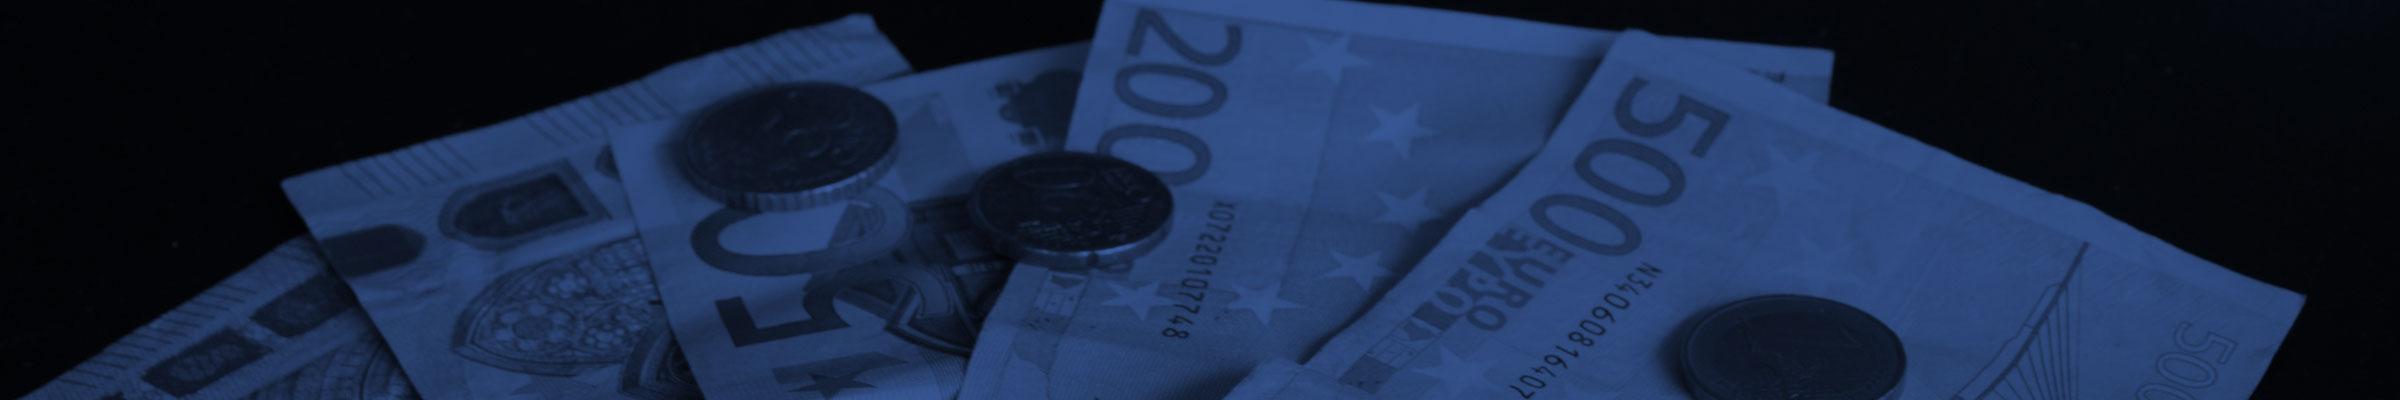 Abogado especializado gastos hipoteca